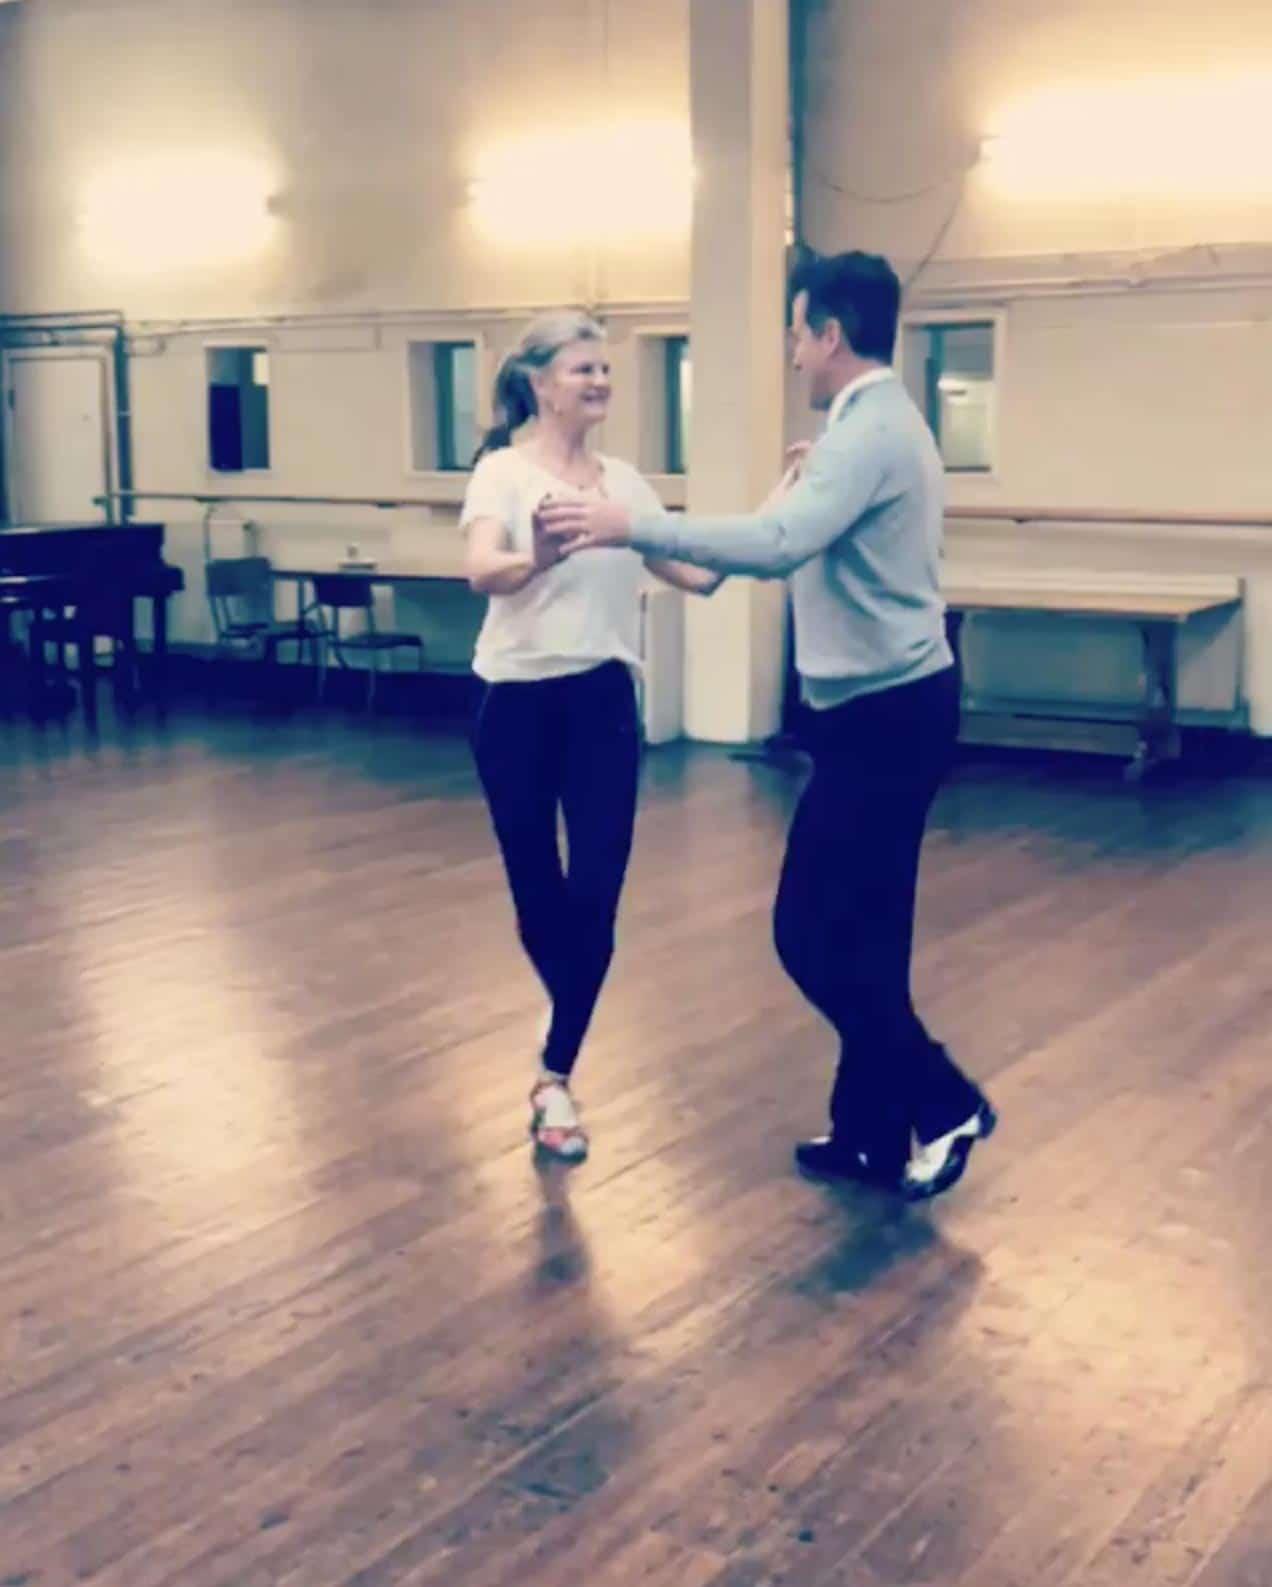 Anton Susannah dance video 1